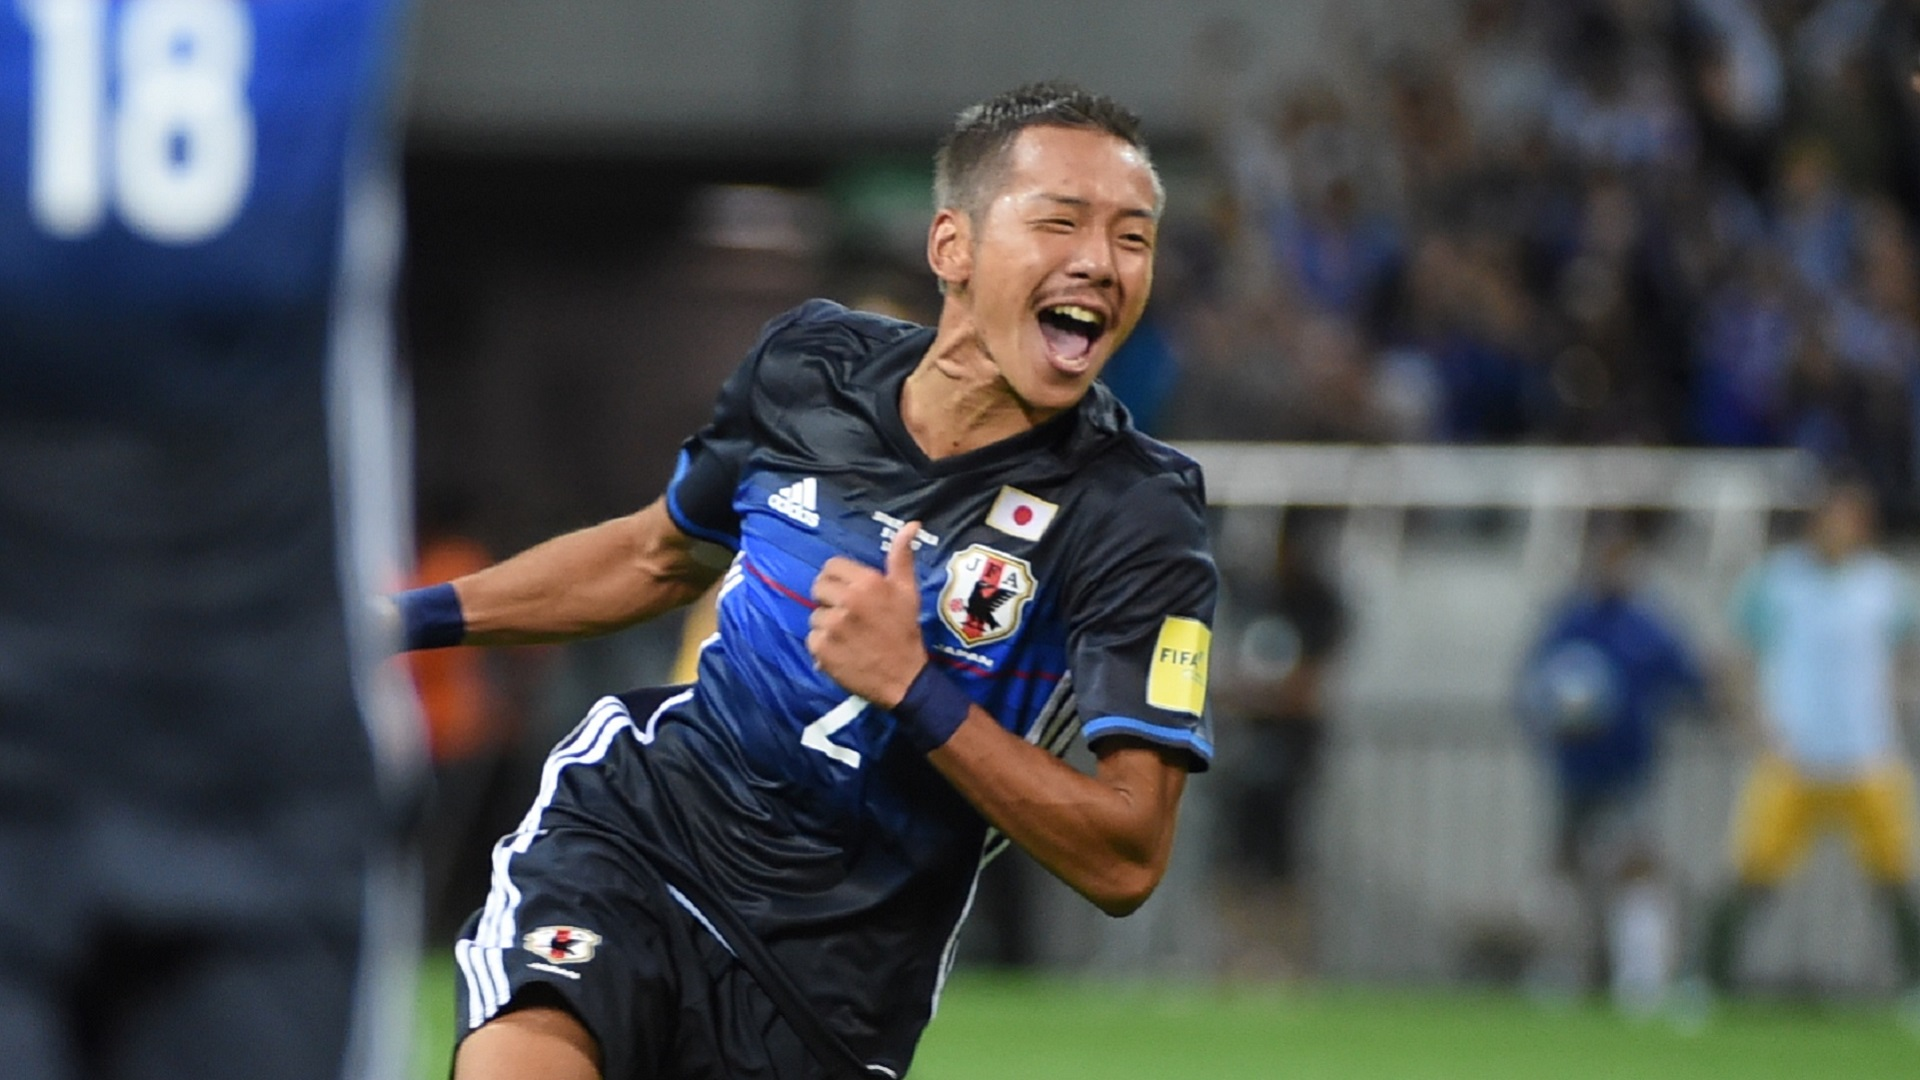 2017-08-31 Ideguchi Japan